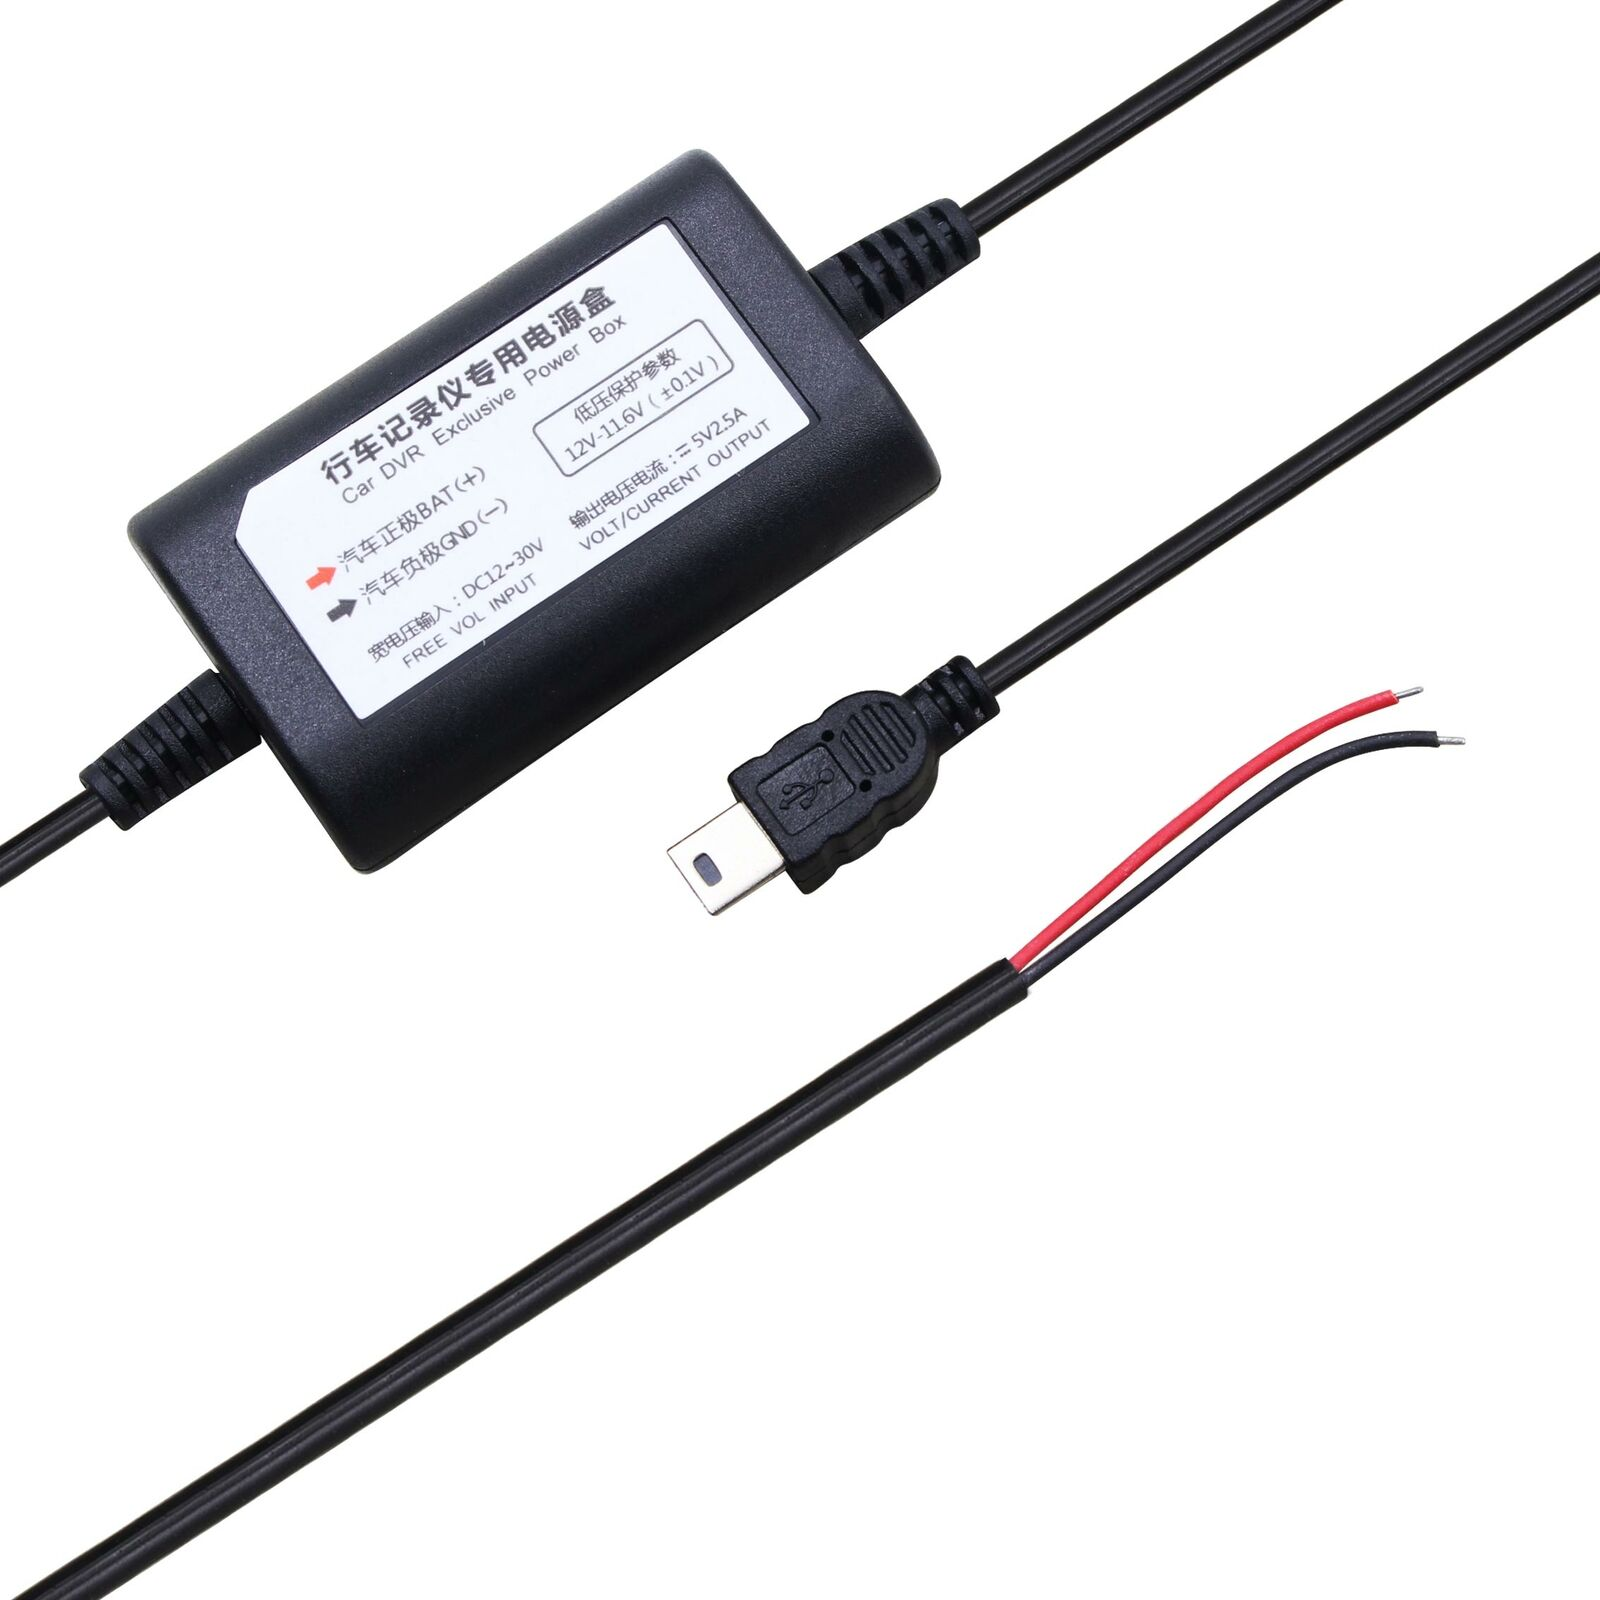 Hardwire USB Car Charger power cord for Garmin Dash Cam 30 35 GDR33 43 Dashcam